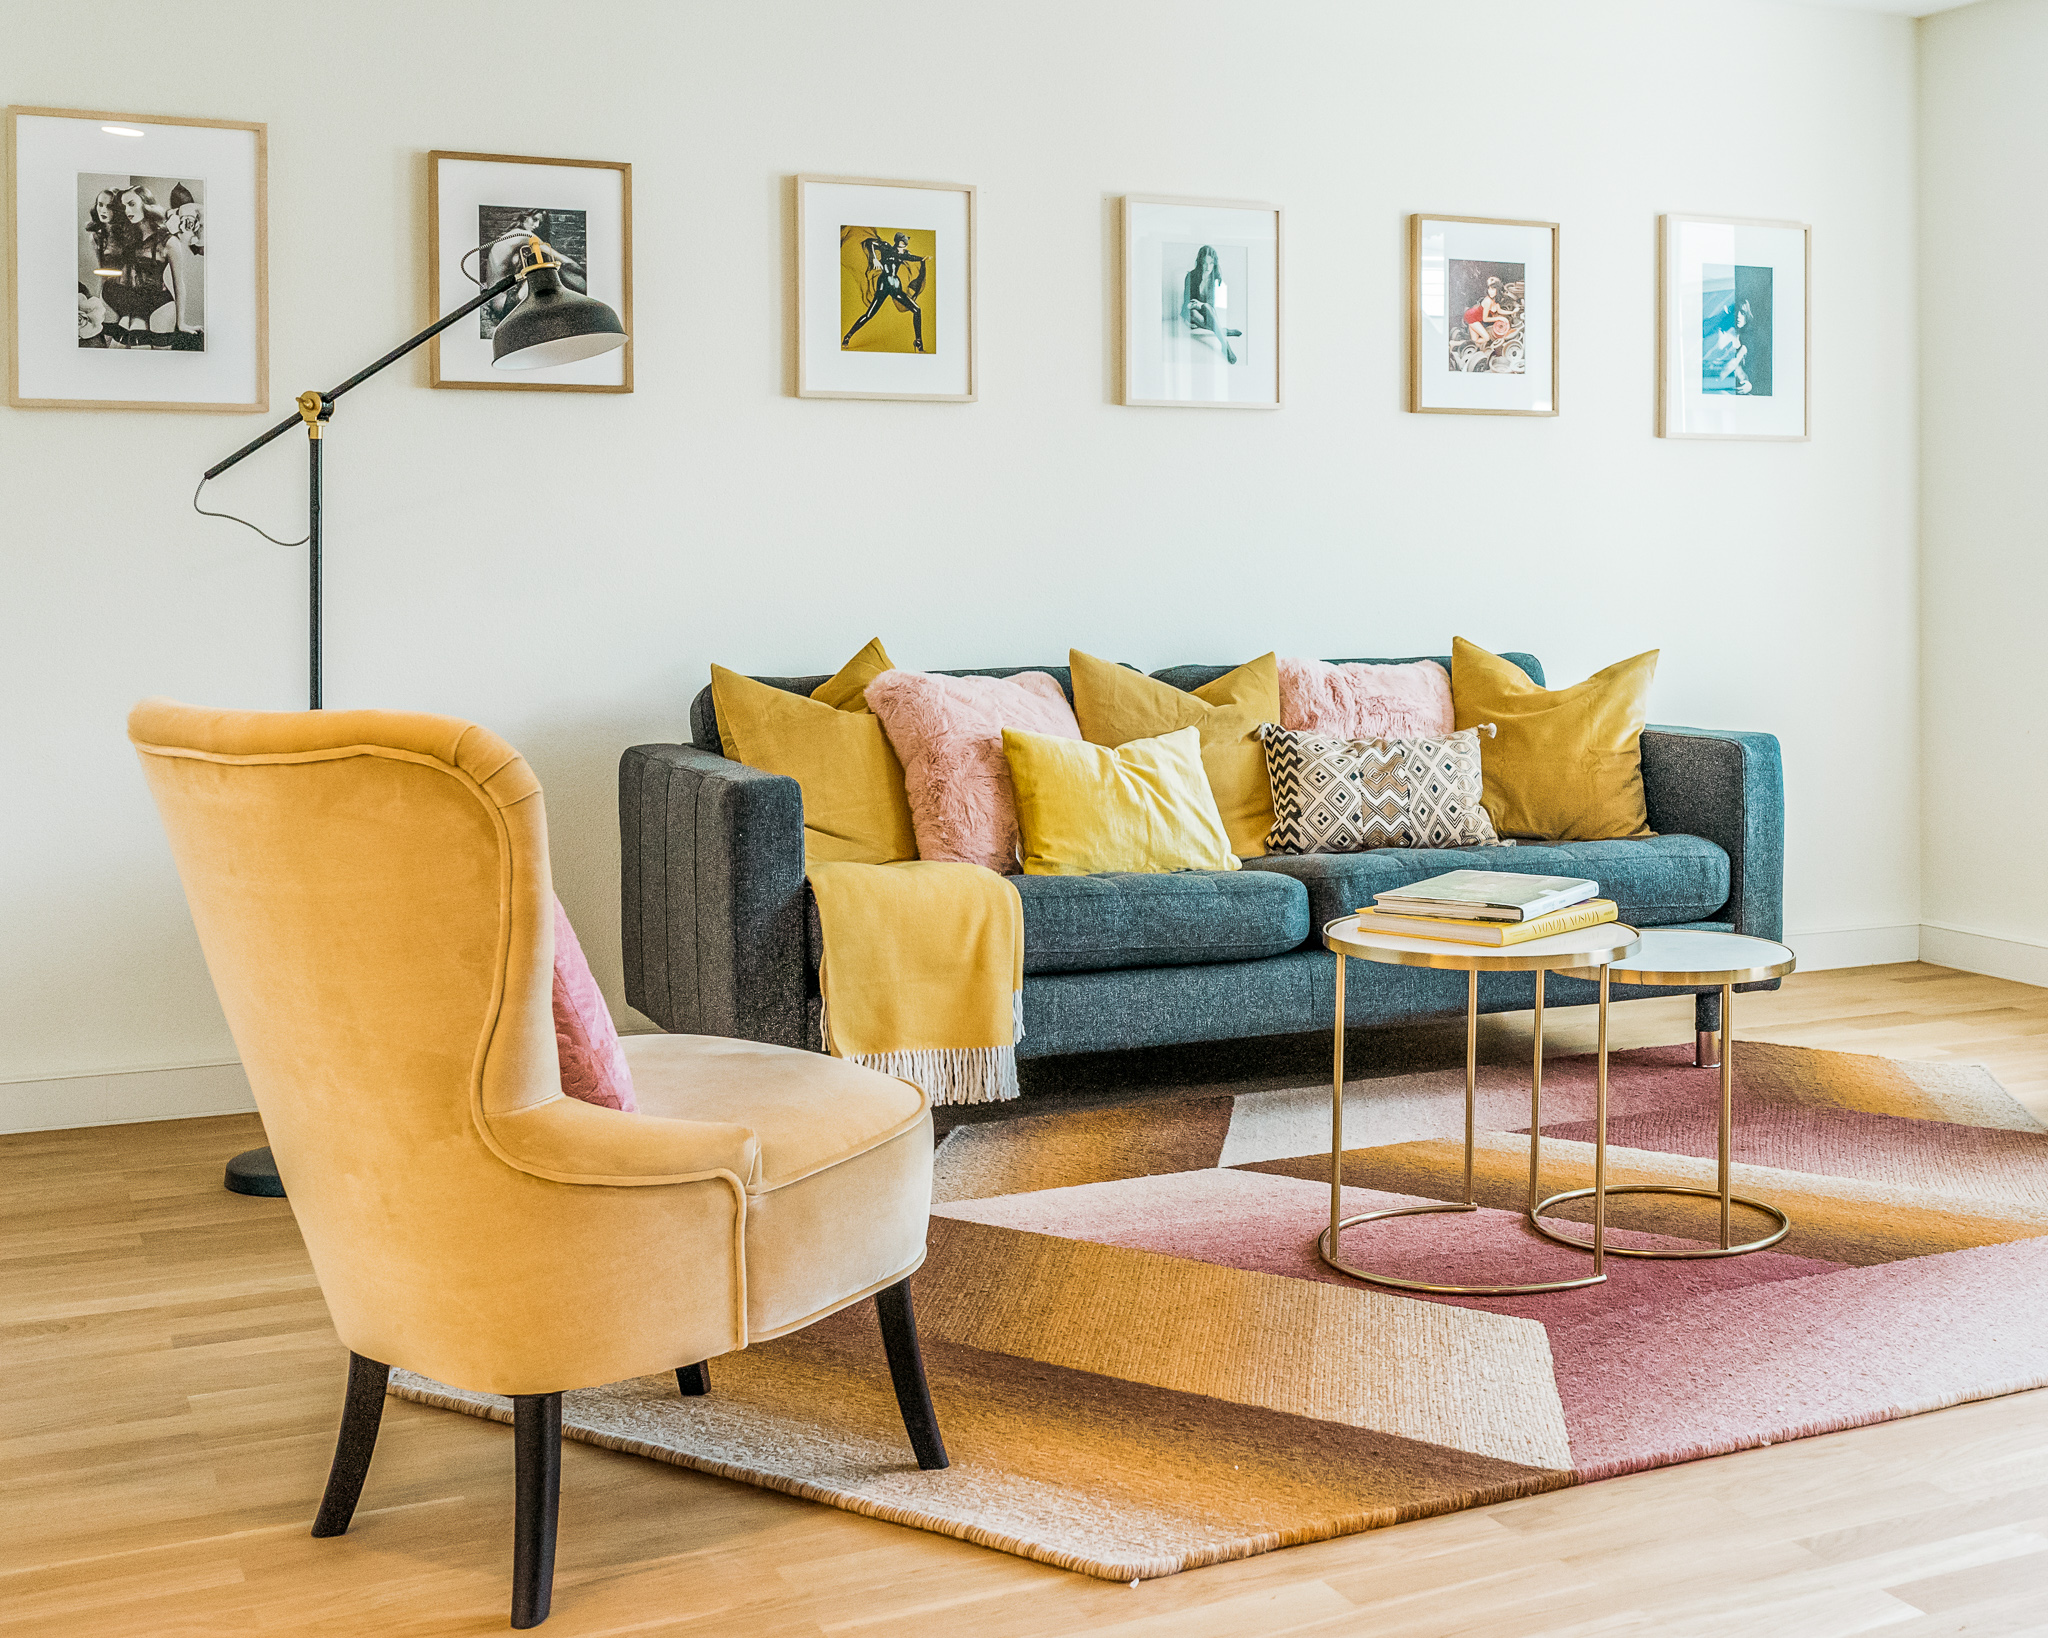 Sofa in office